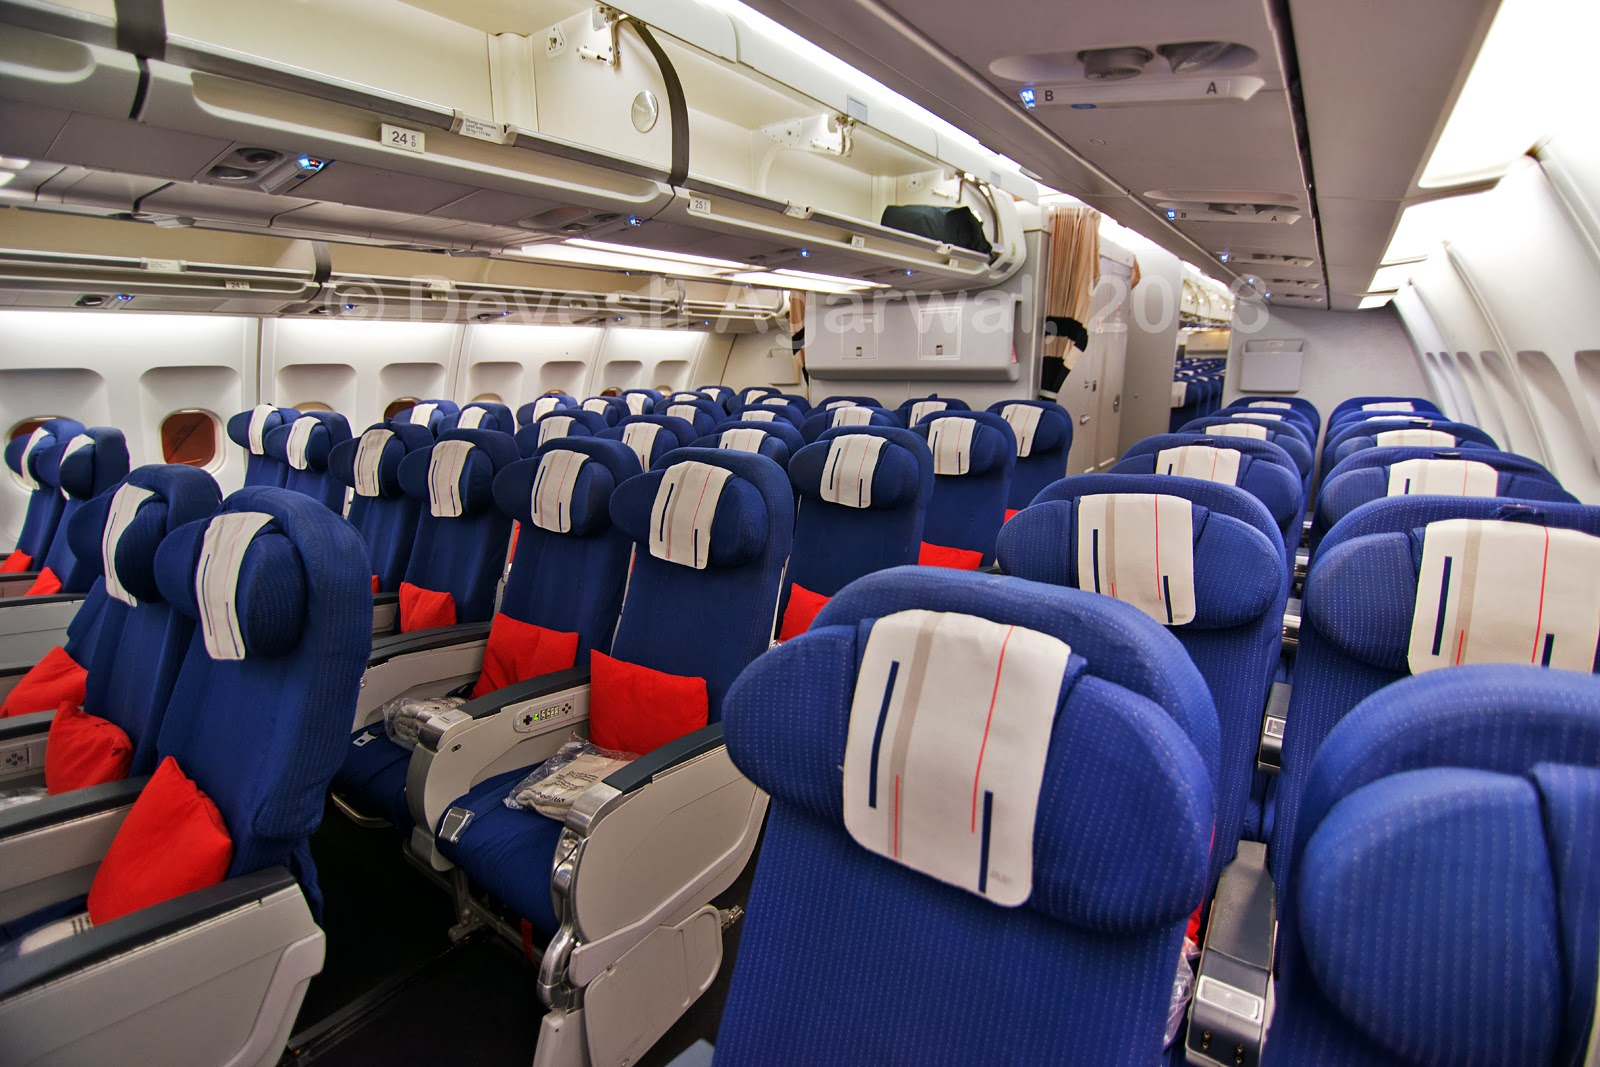 AdGrab Our Cheapest Flight Deals to Canada - Compare Multiple Sites!Destinations: Las Vegas, Toronto, London, Philippines, Dubai, Los Angeles.